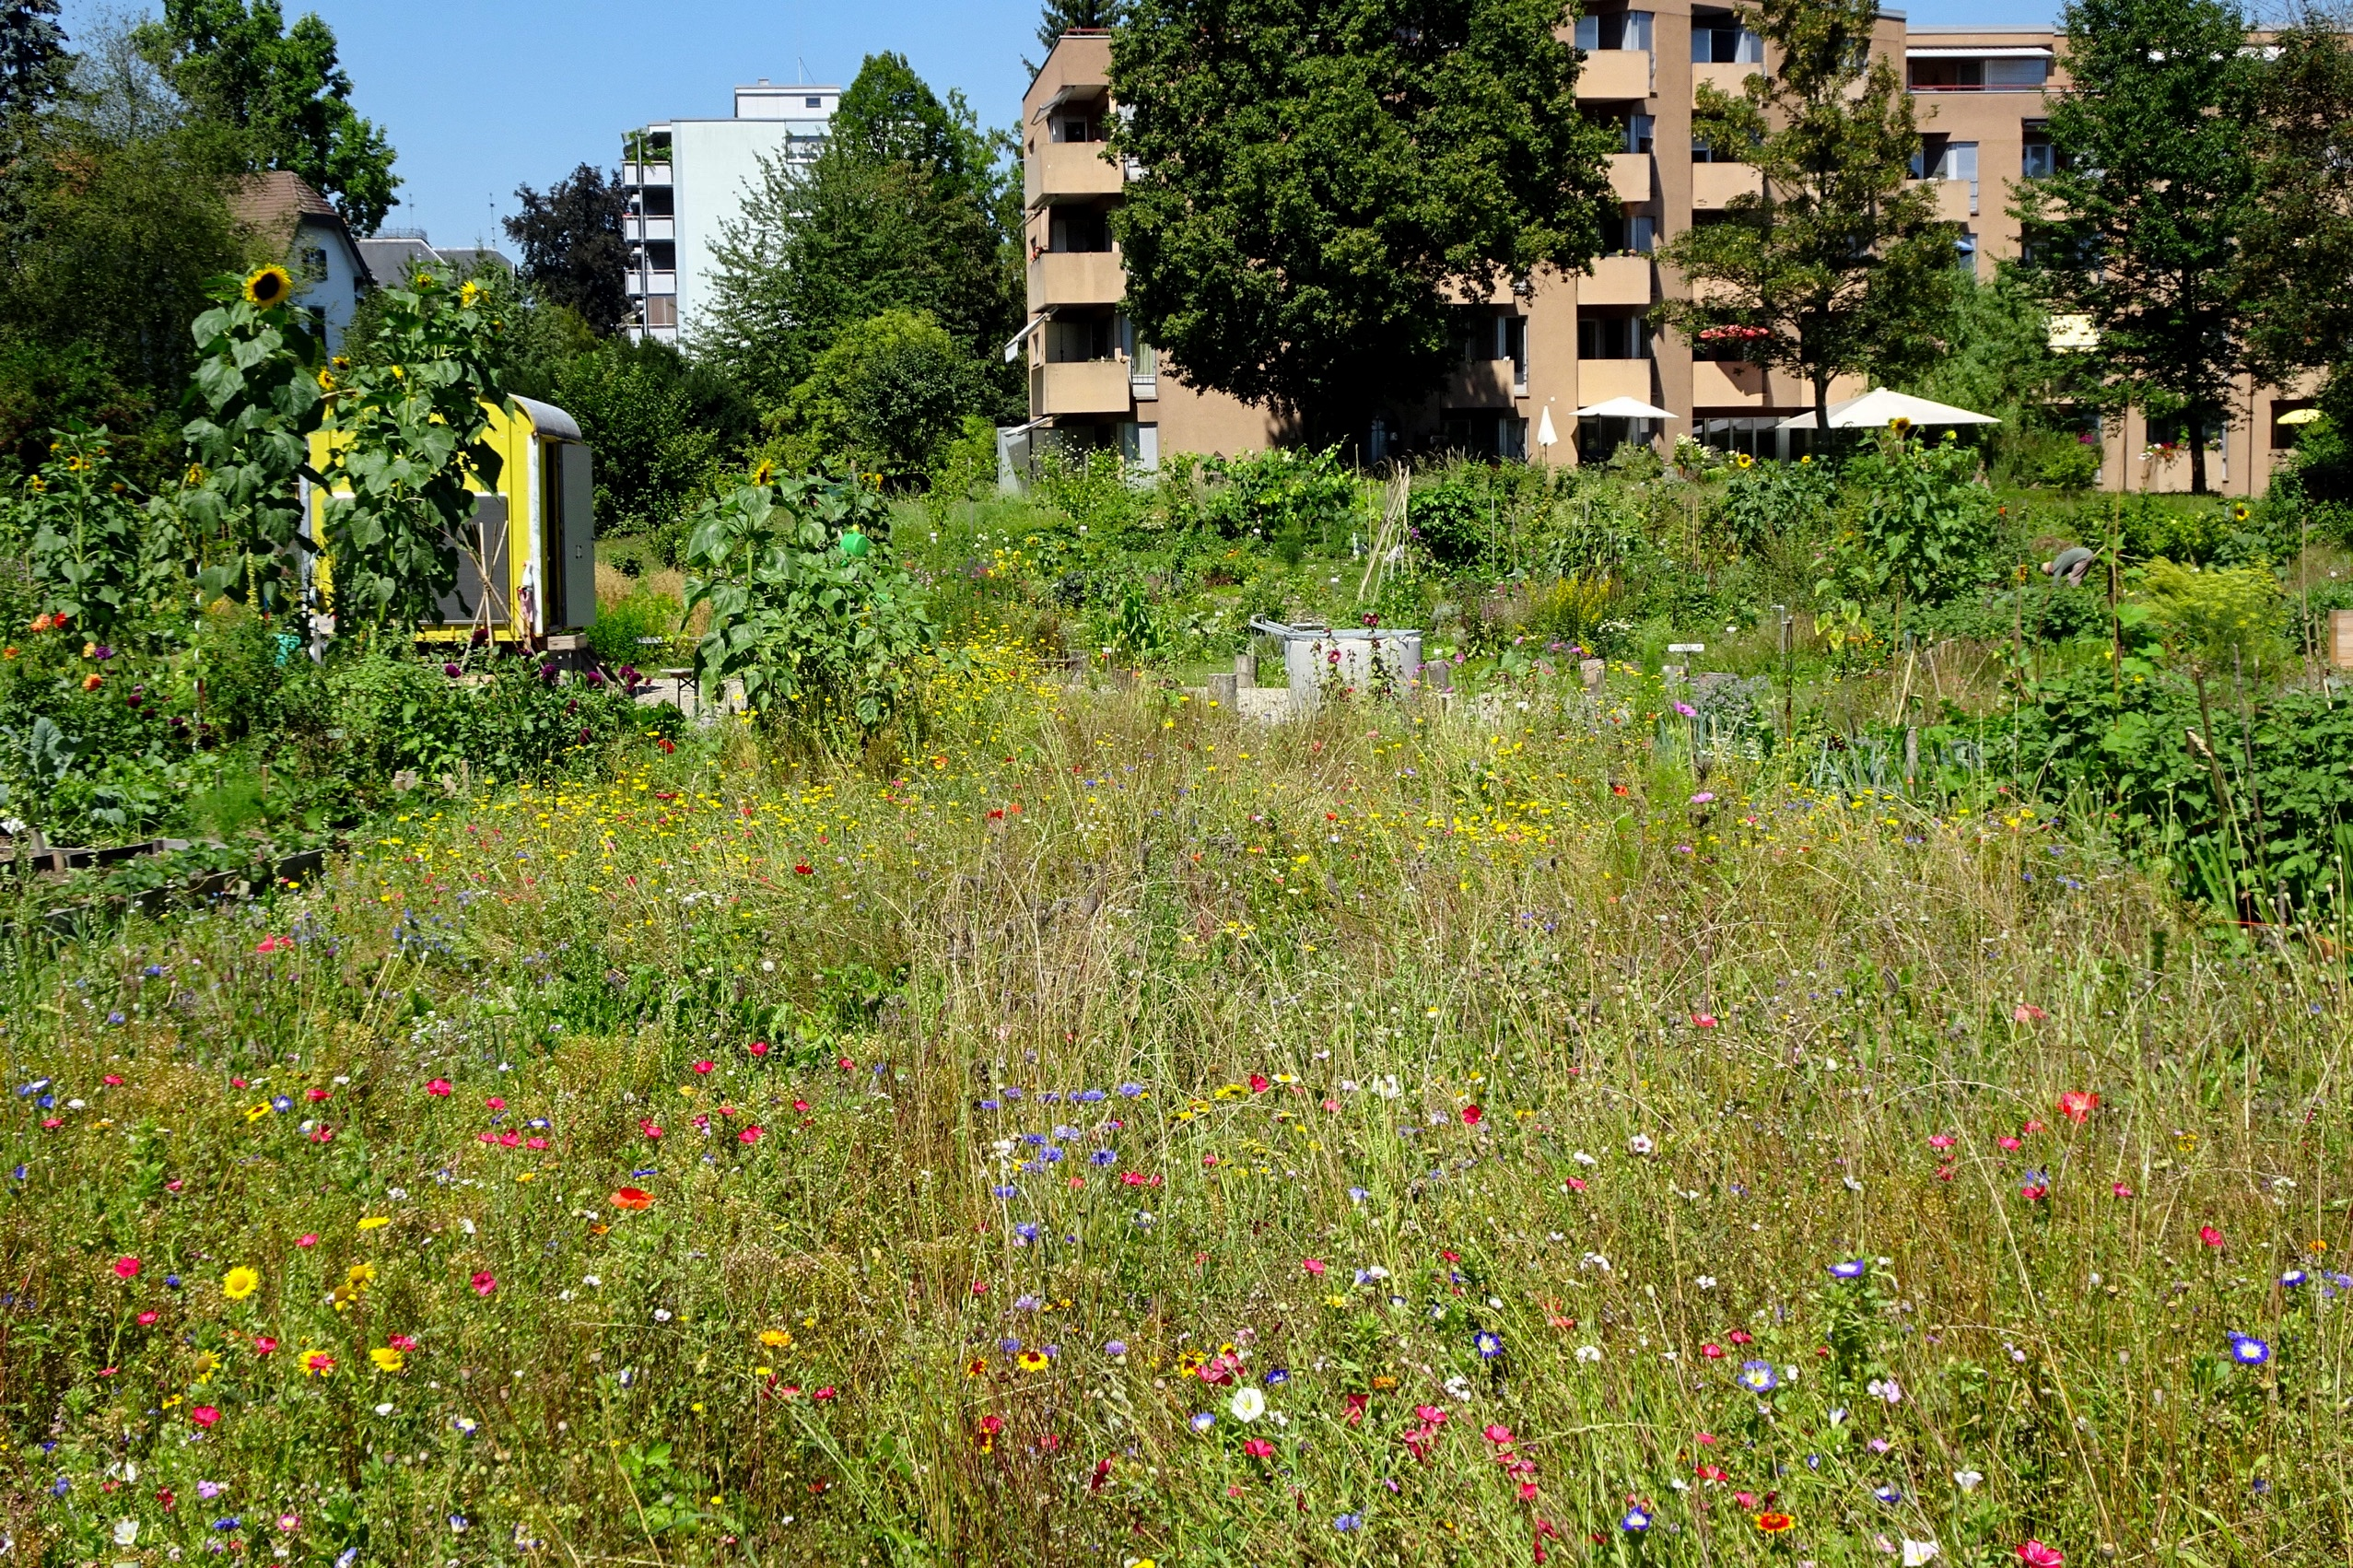 2020-08-07 Ogif Garten 05